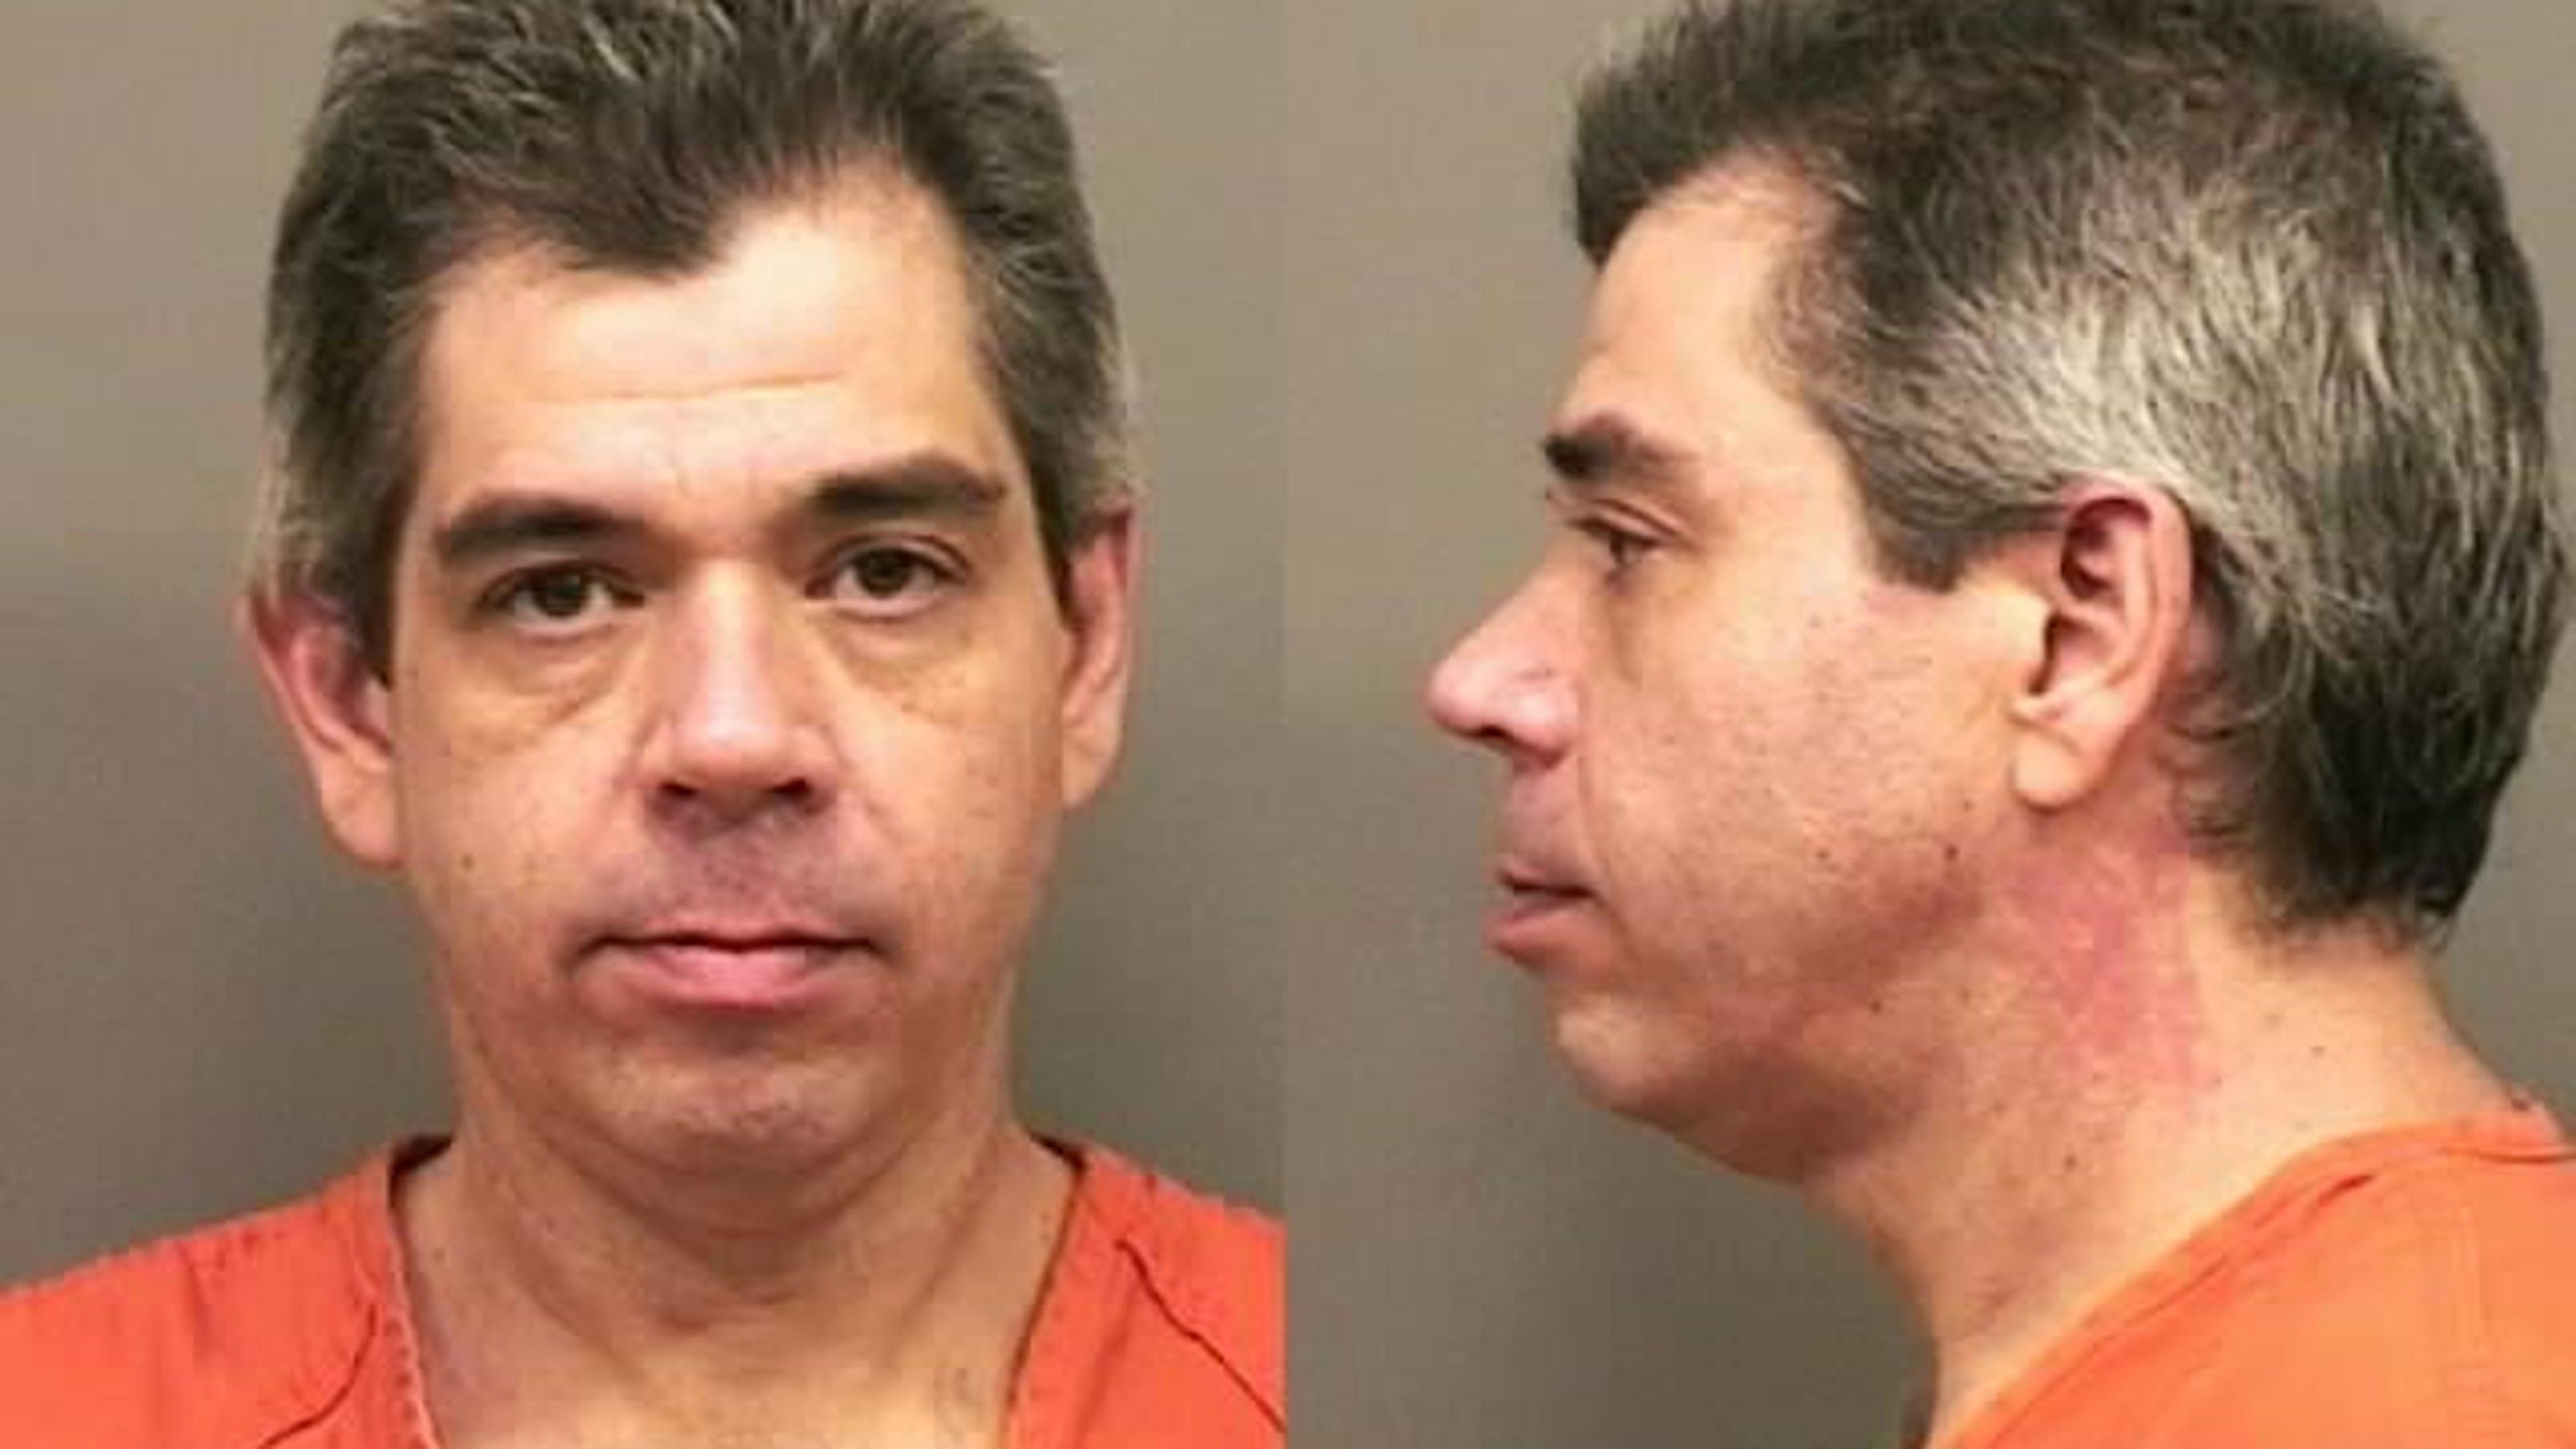 Police Arrest Man Using Craigslist To Sell Stolen Property